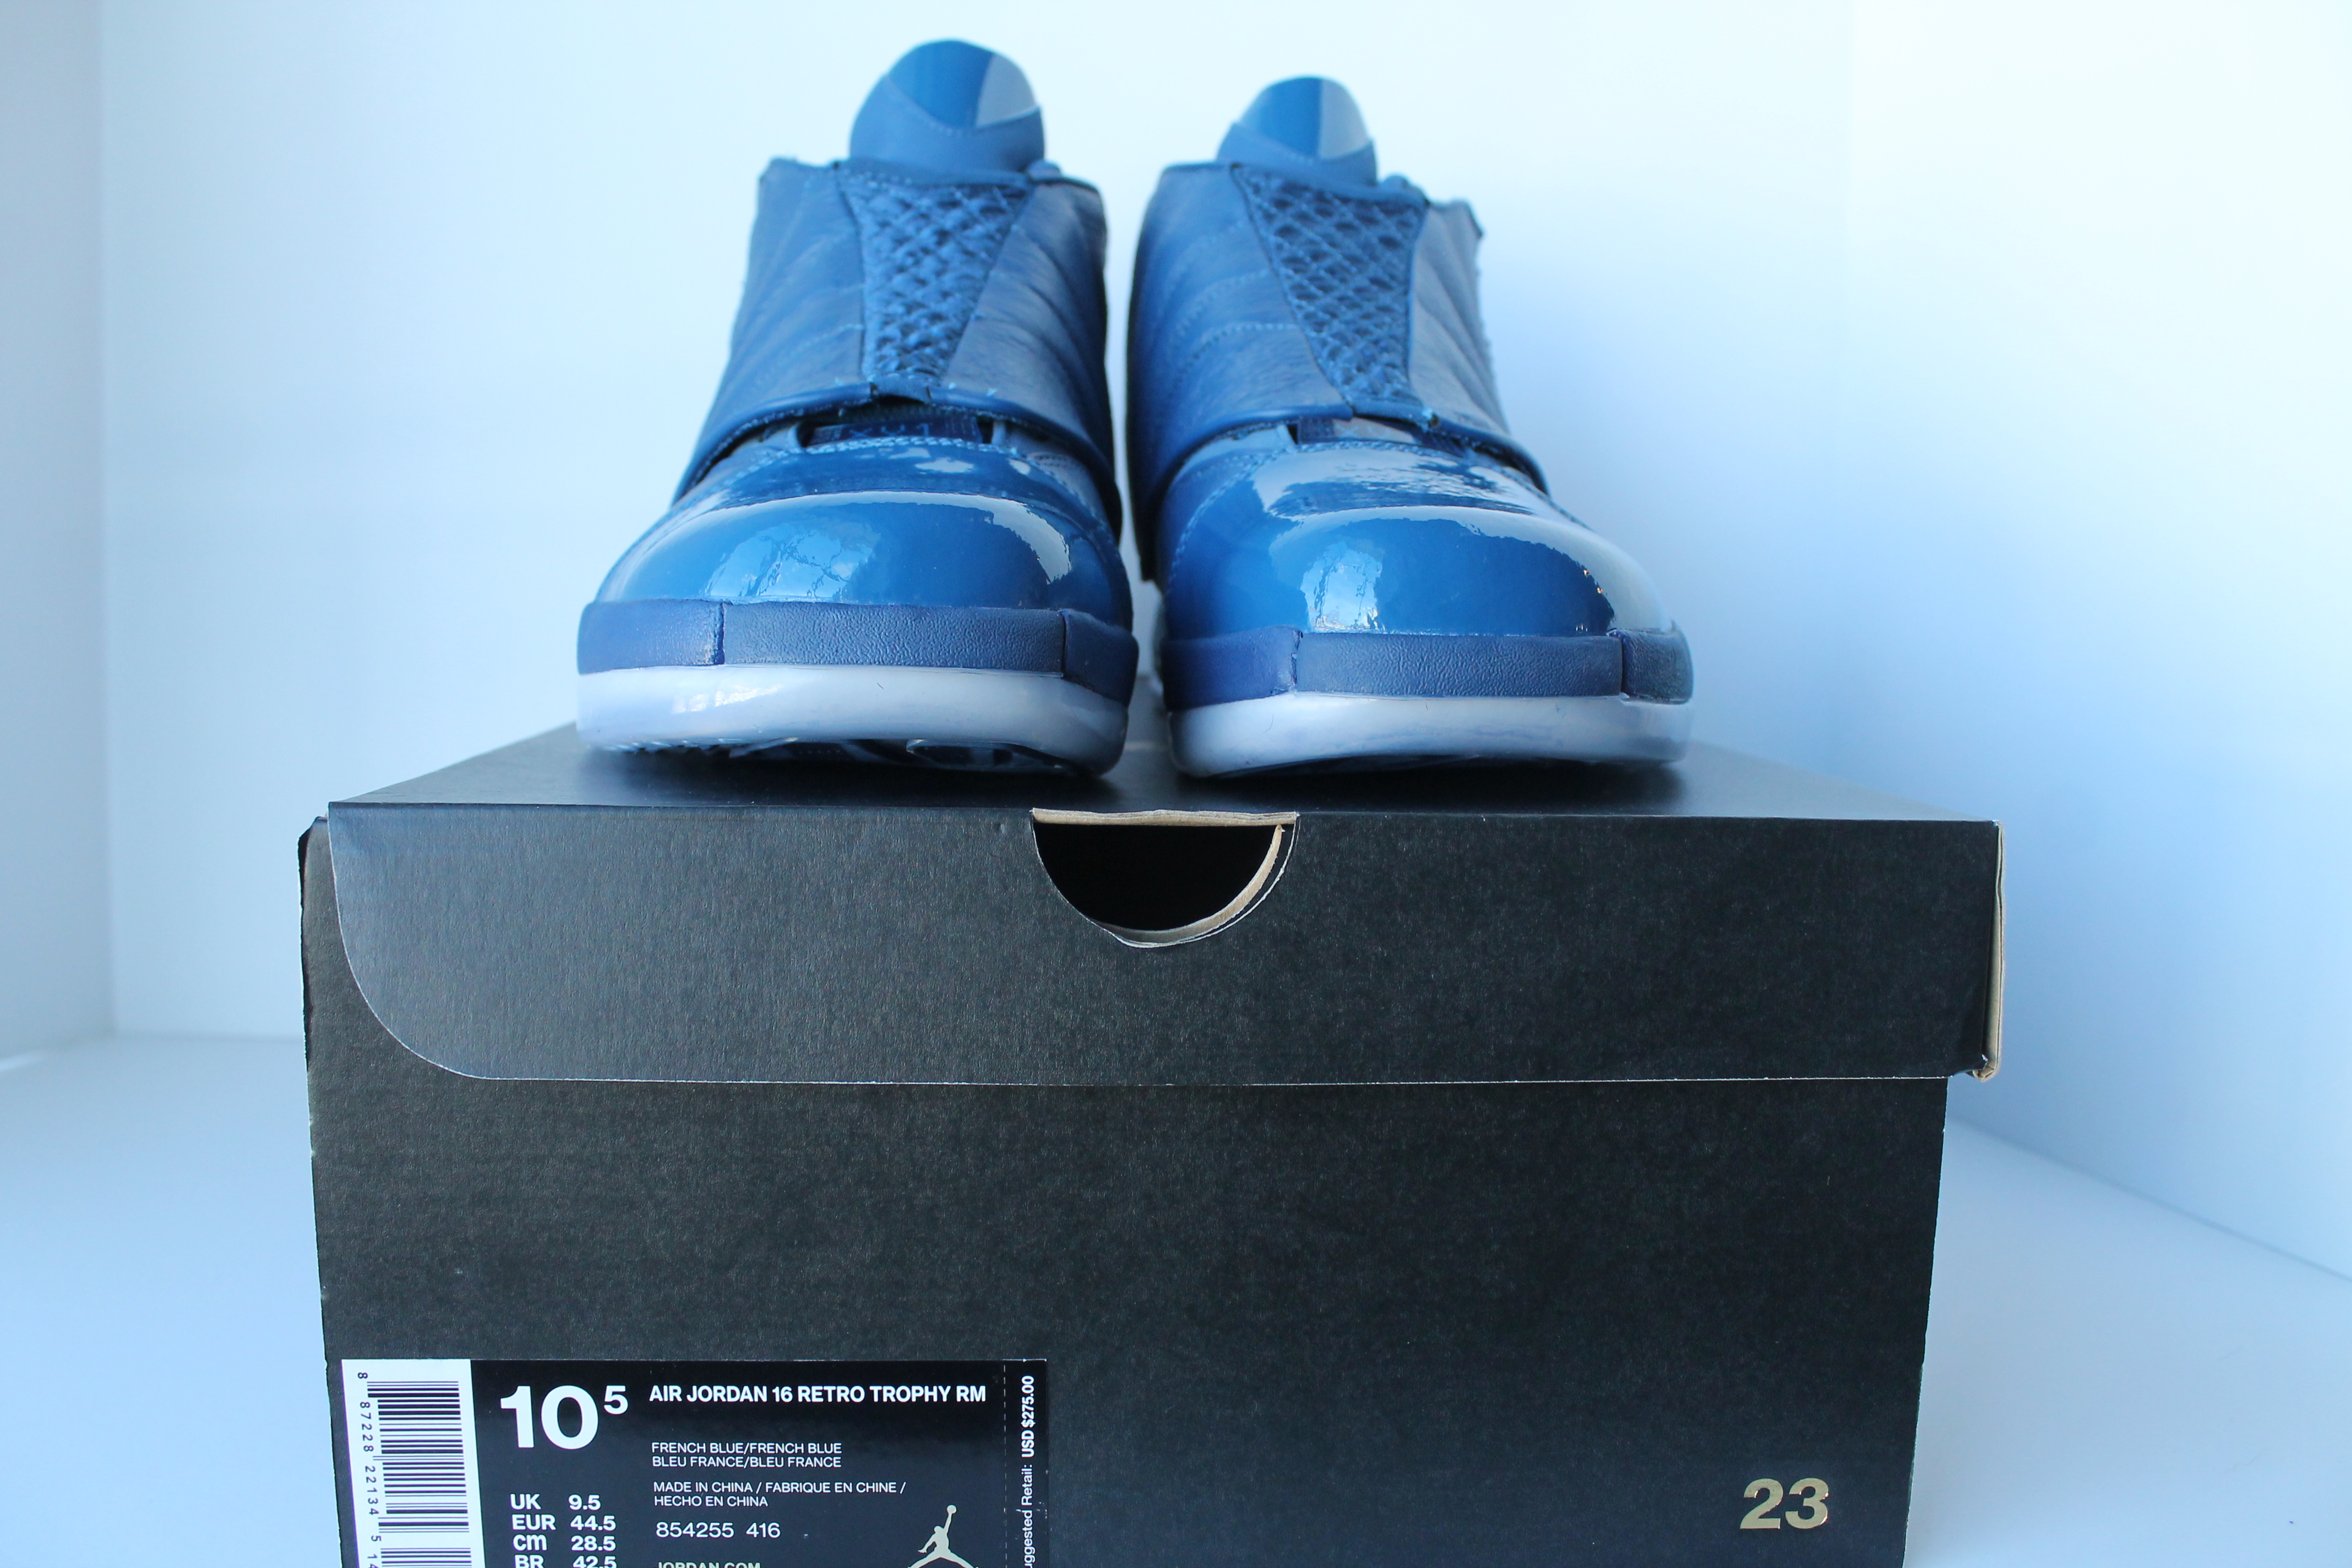 3f441949d92 AuthentKicks | Air Jordan 16 Retro Trophy Room